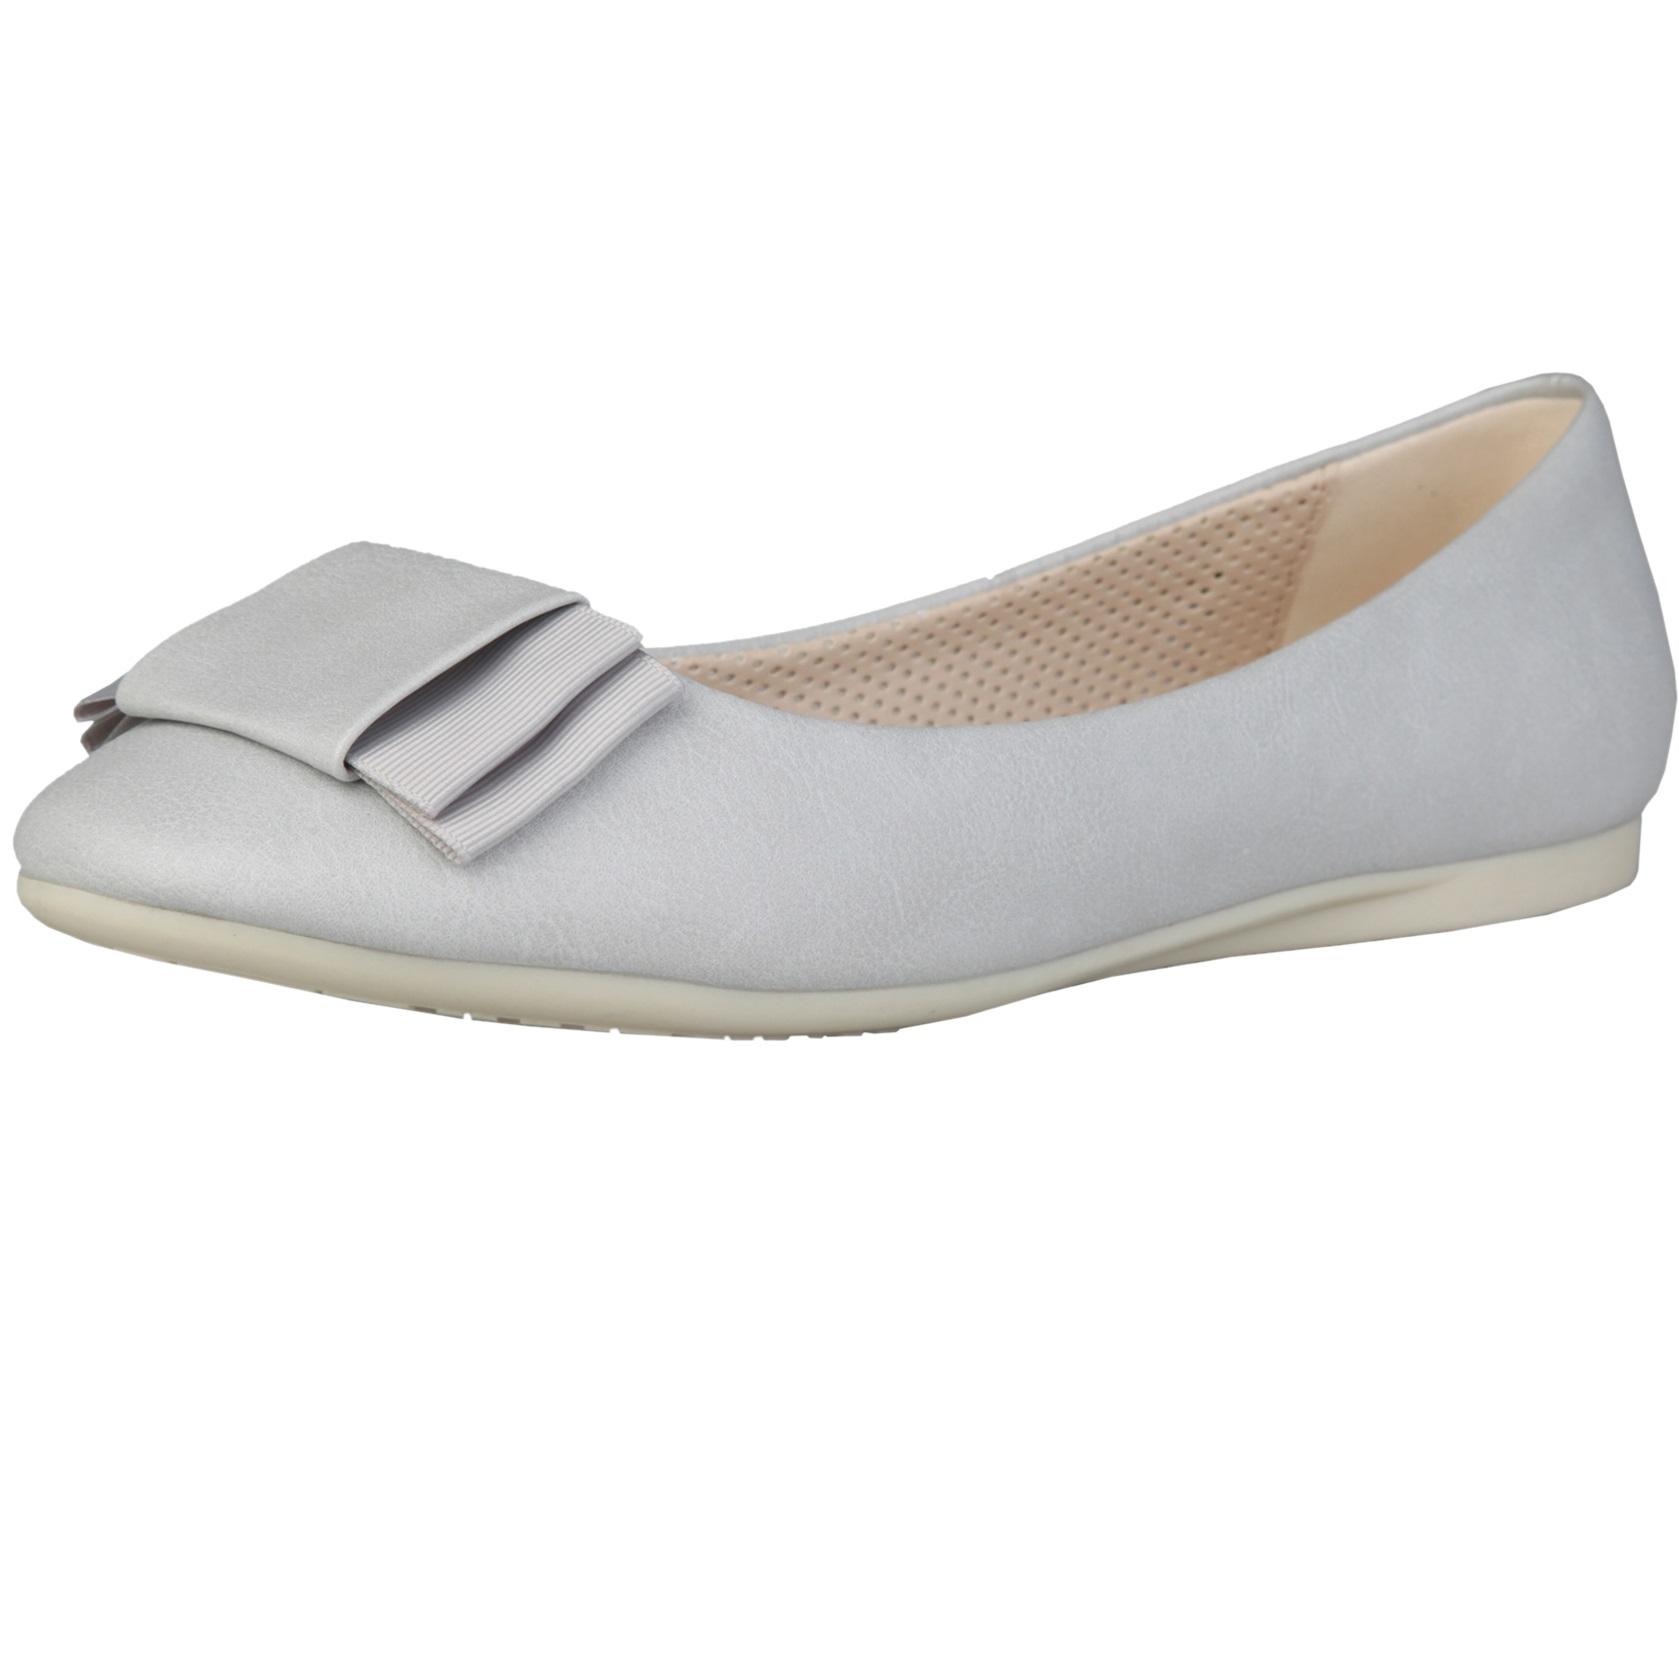 Sofia Loes Flat Shoes Fiocco Argento Rf600155